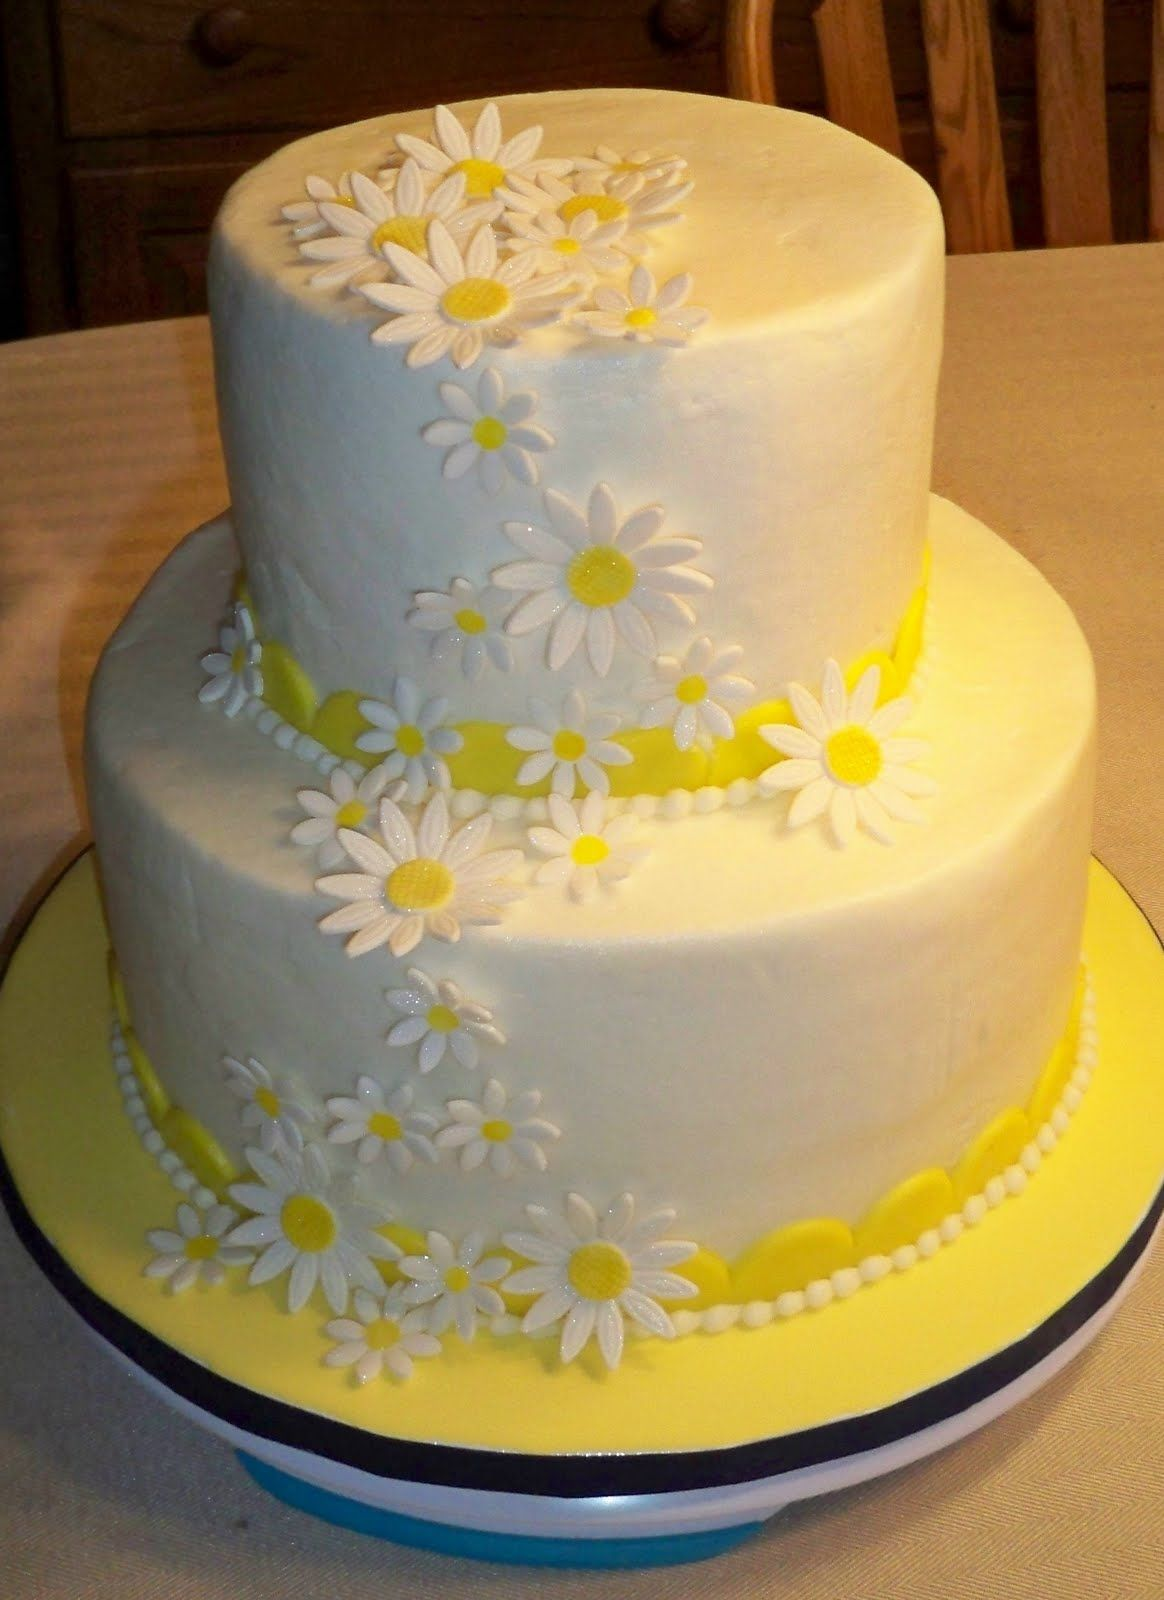 Daisy Cake Food 70th Birthday Cake Mum 50th Wedding